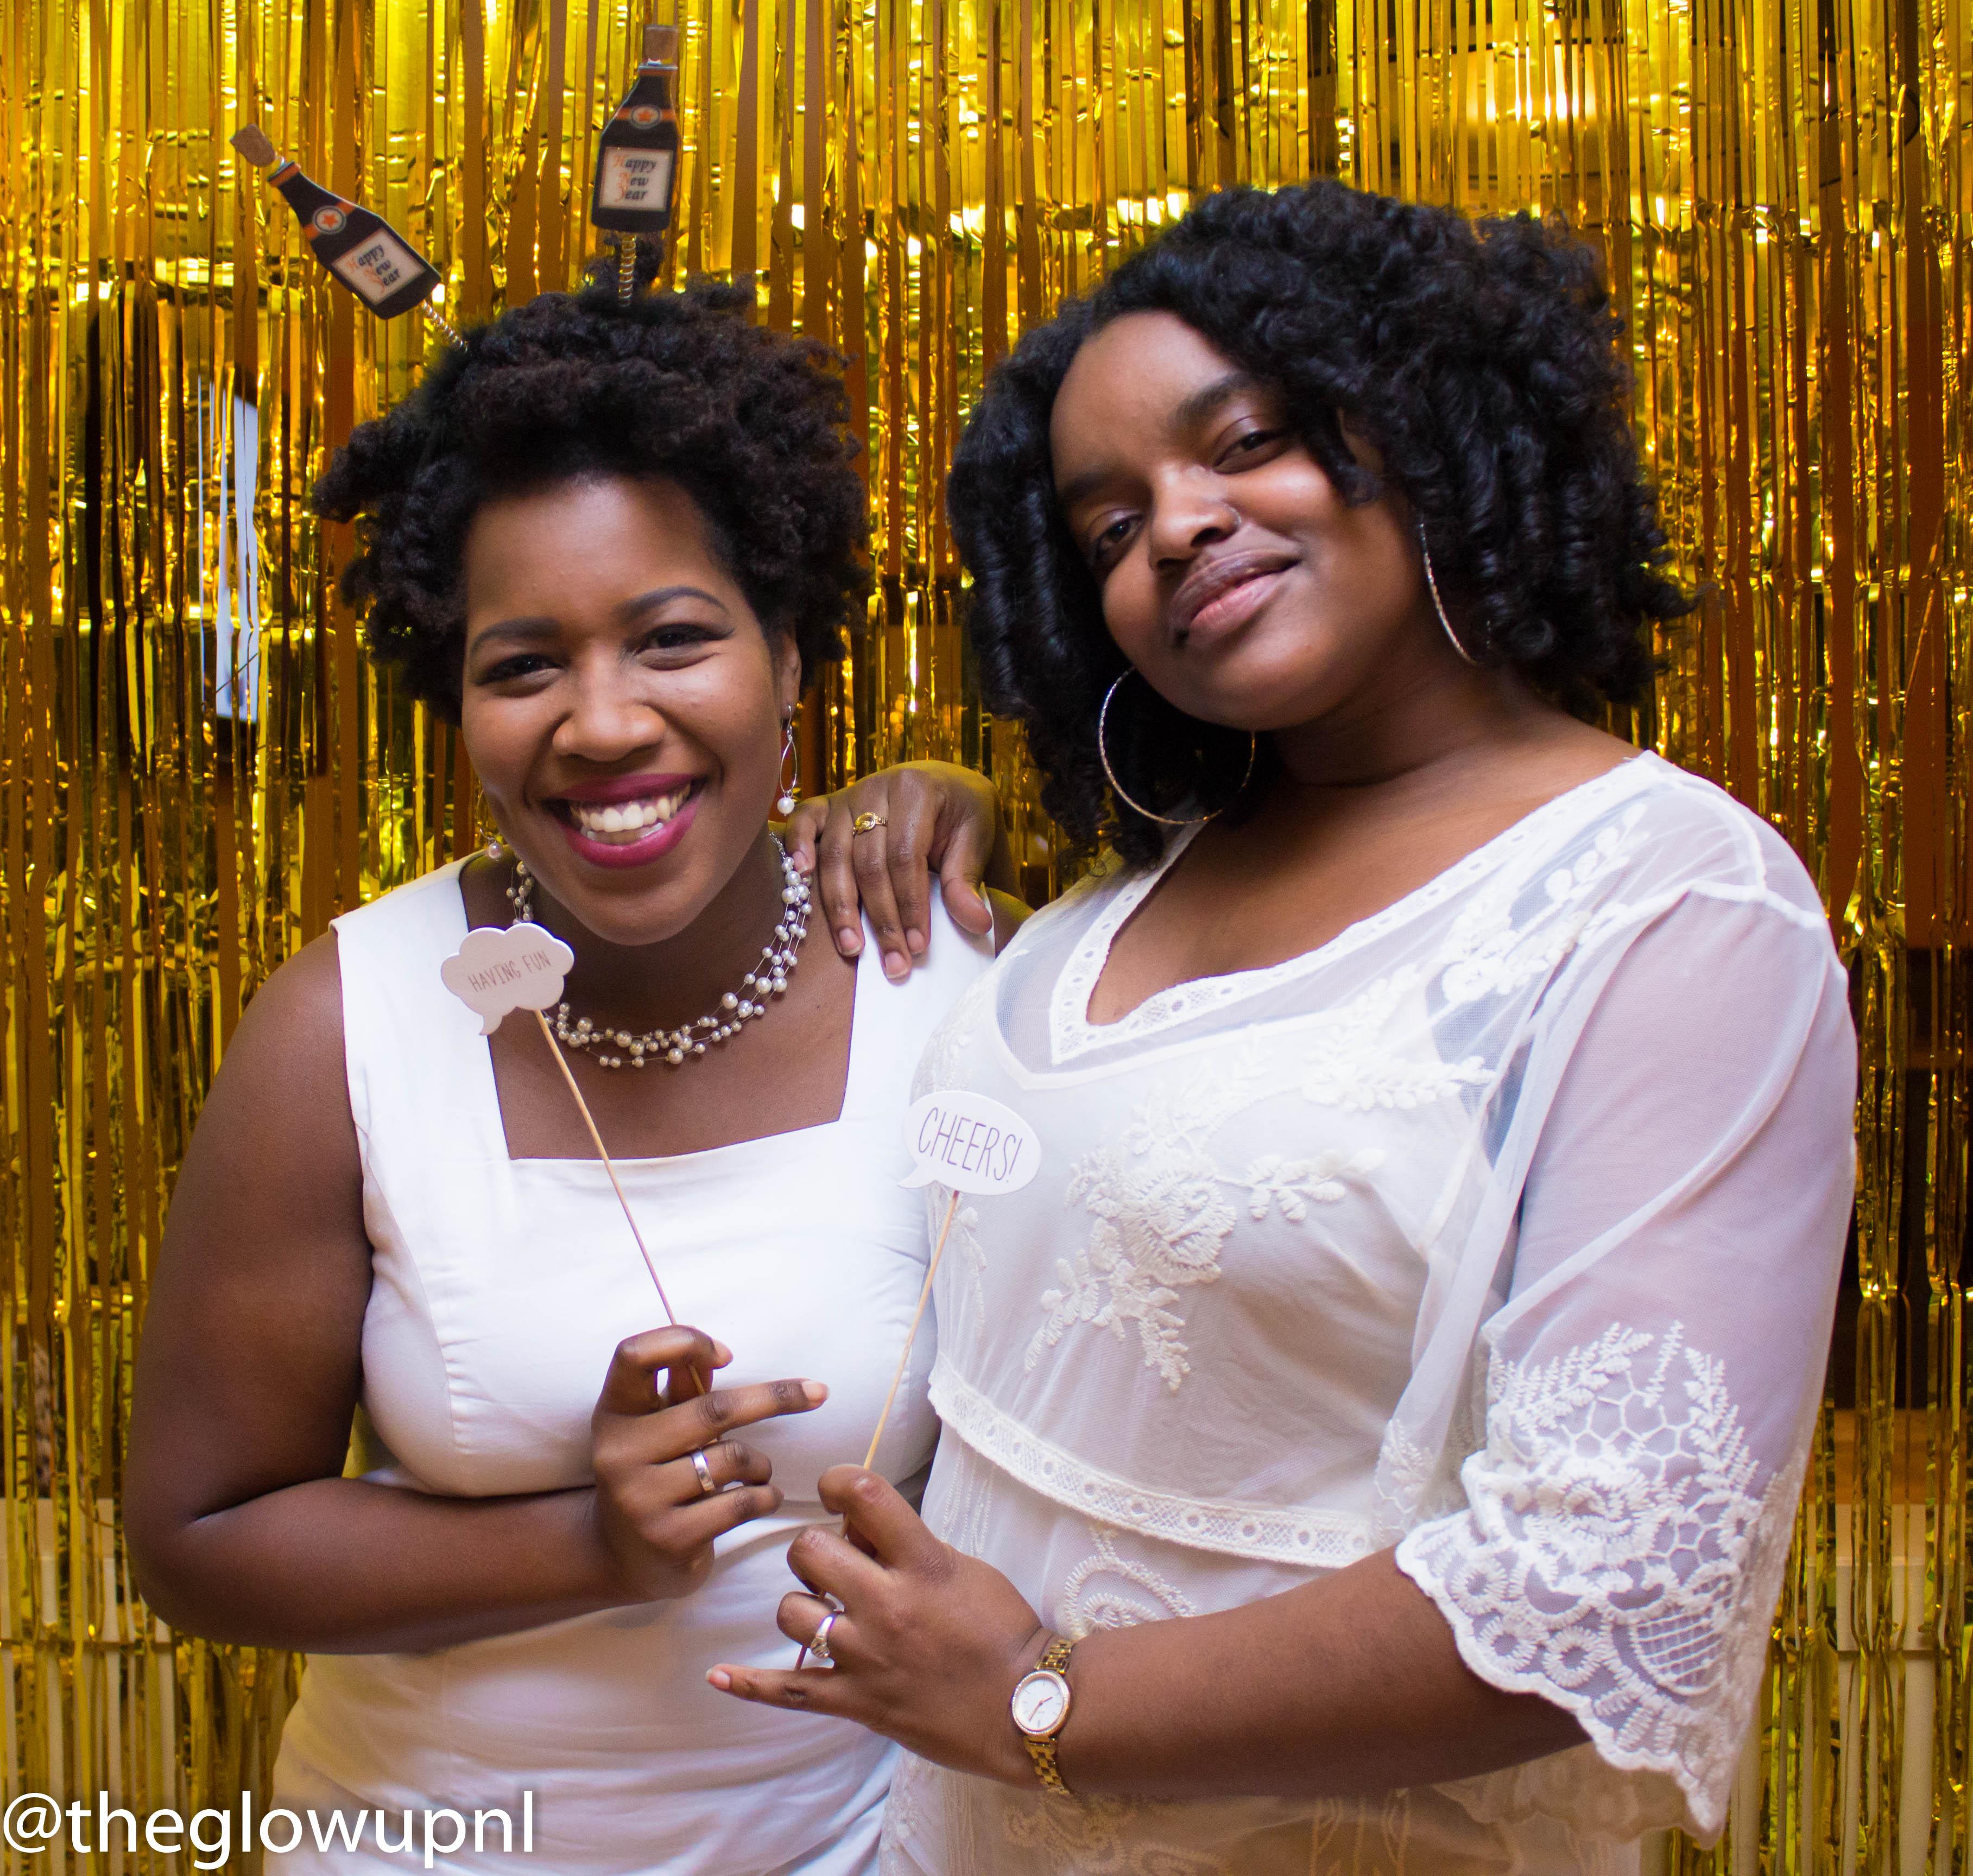 Charlene en Rowan tijdens The Glow Up presents A Champagne Celebration. Foto: Snaps by Nova